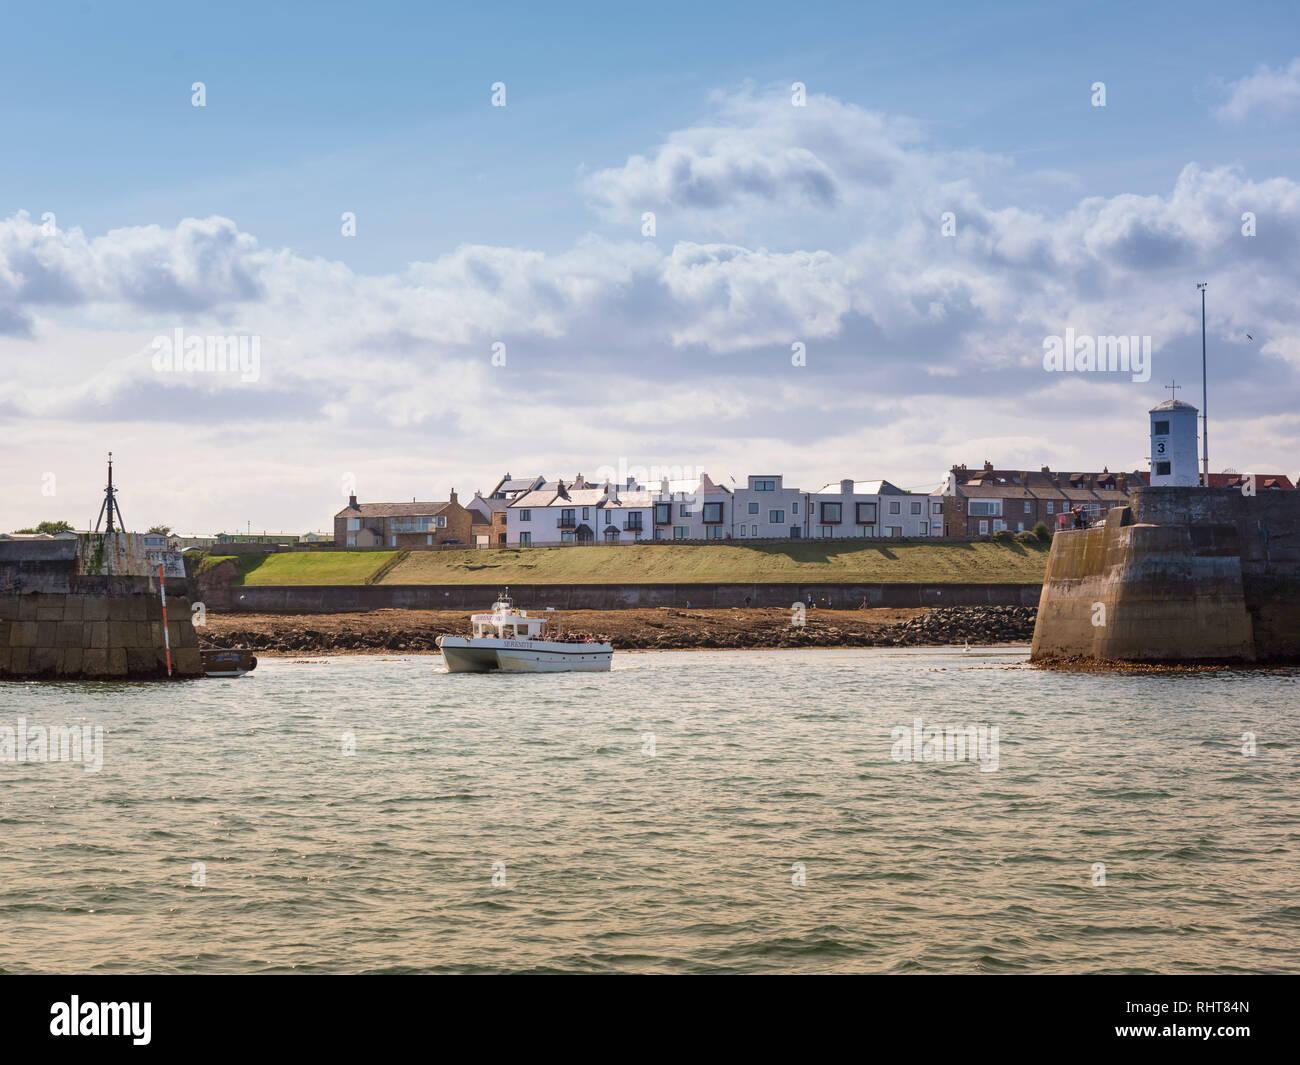 North Sunderland Harbour, Seahouses, Northumberland, UK - Stock Image